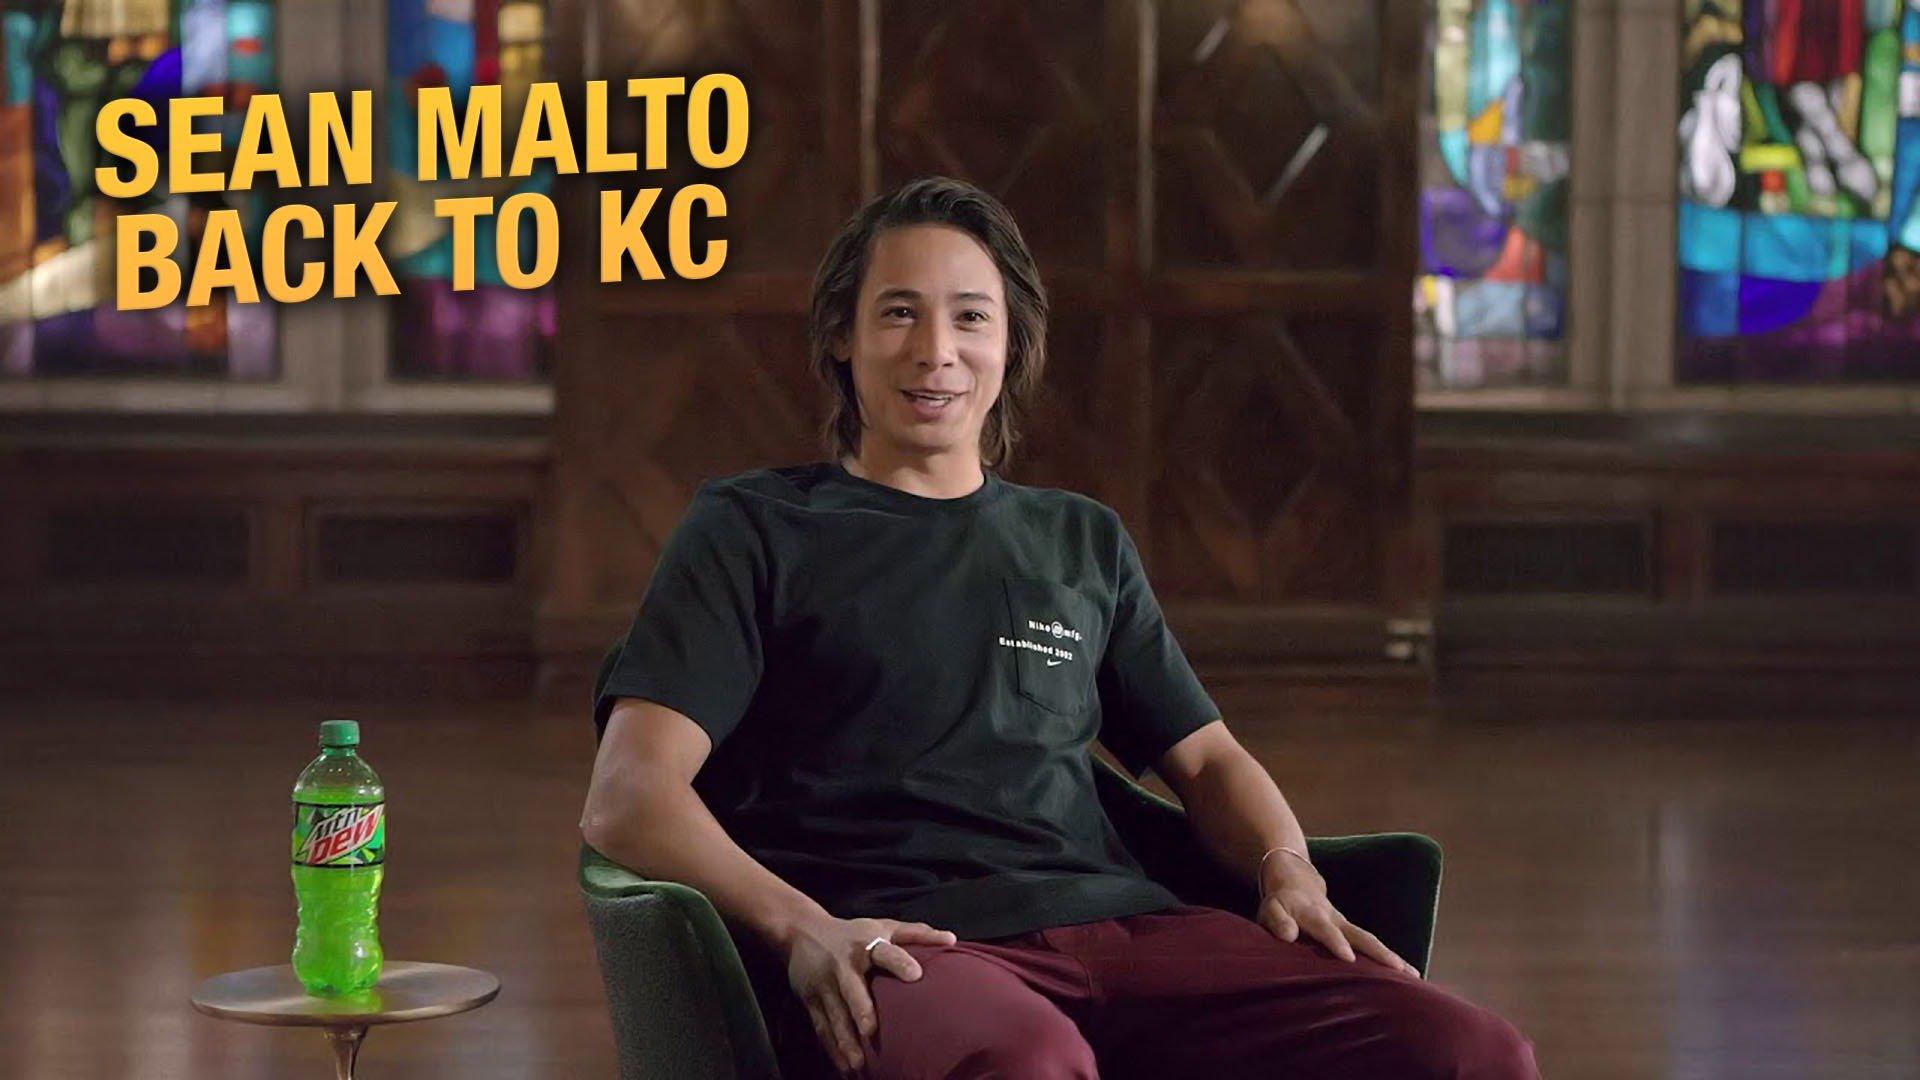 Sean Malto Back to KC